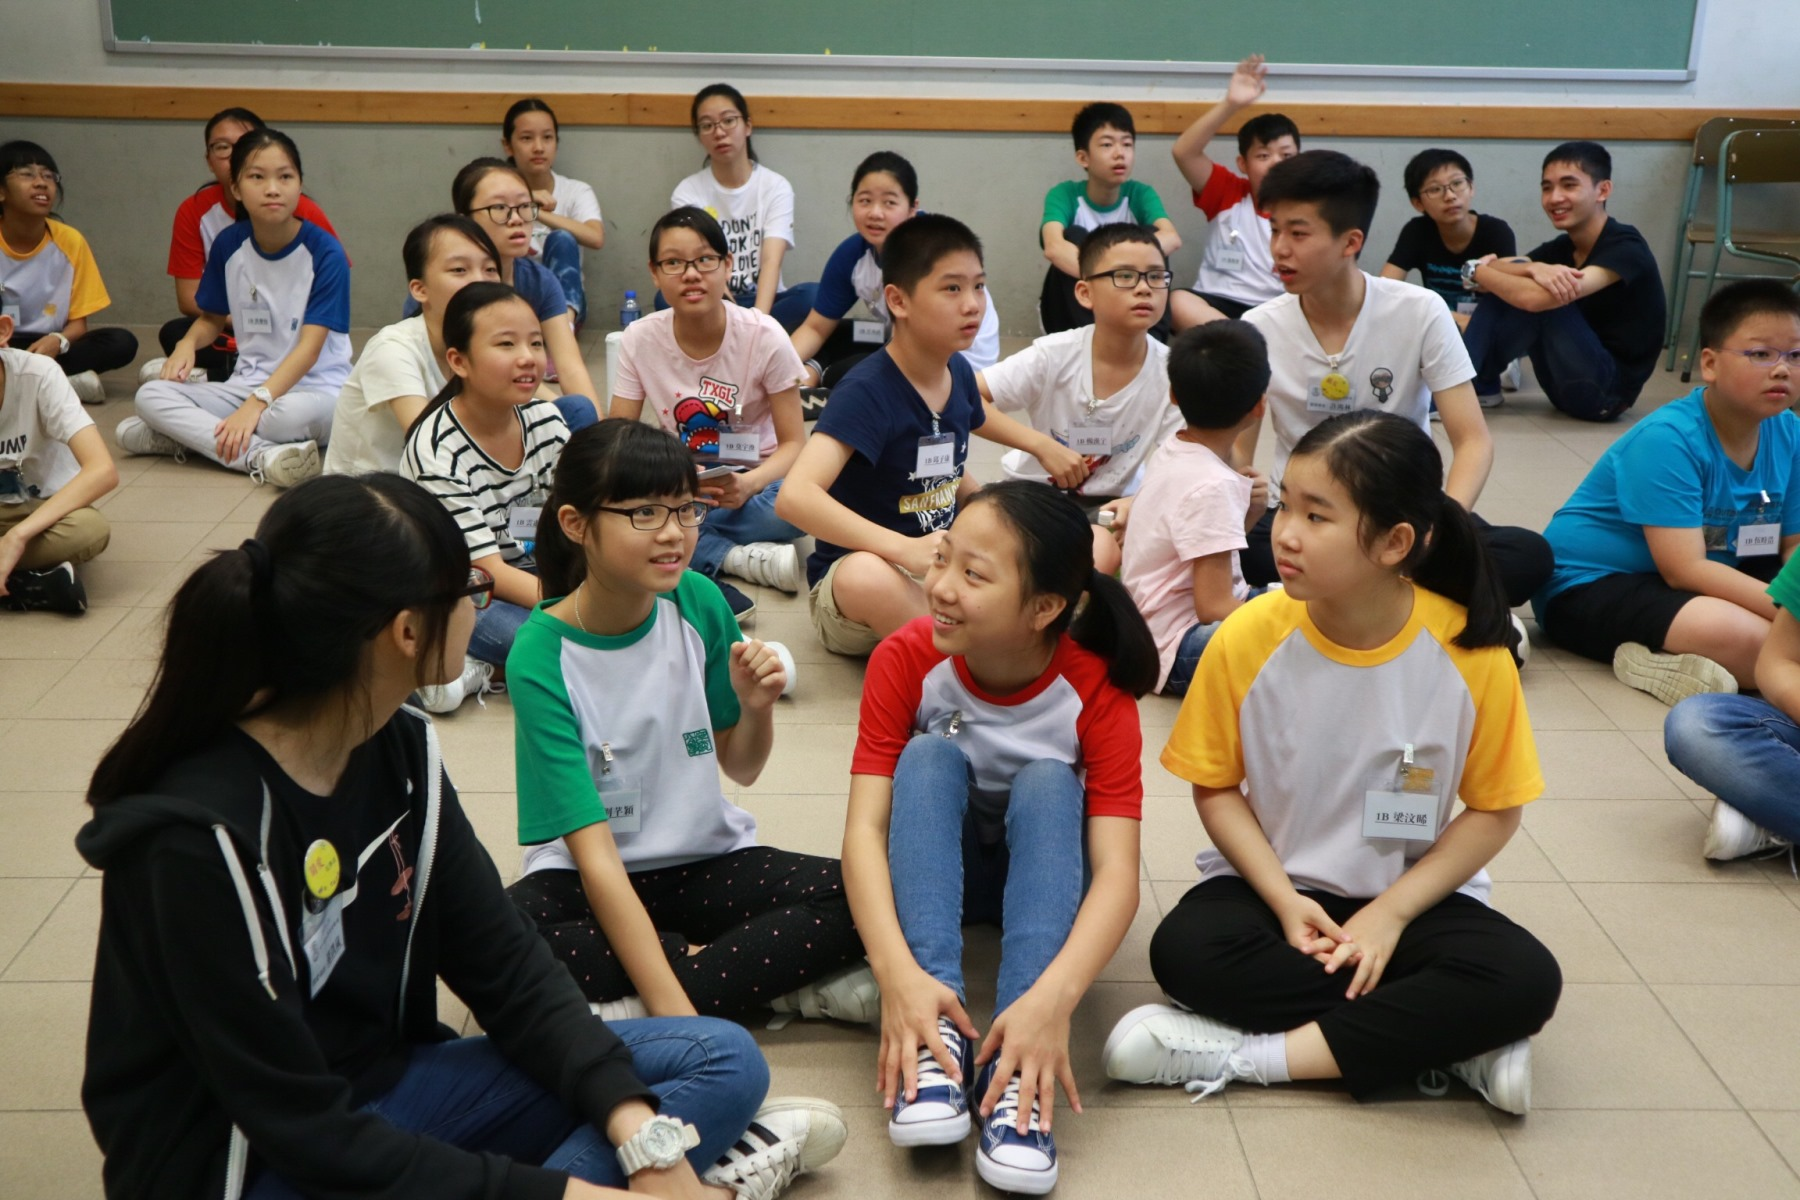 http://www.npc.edu.hk/sites/default/files/1b_dong_dong_nao_05.jpg